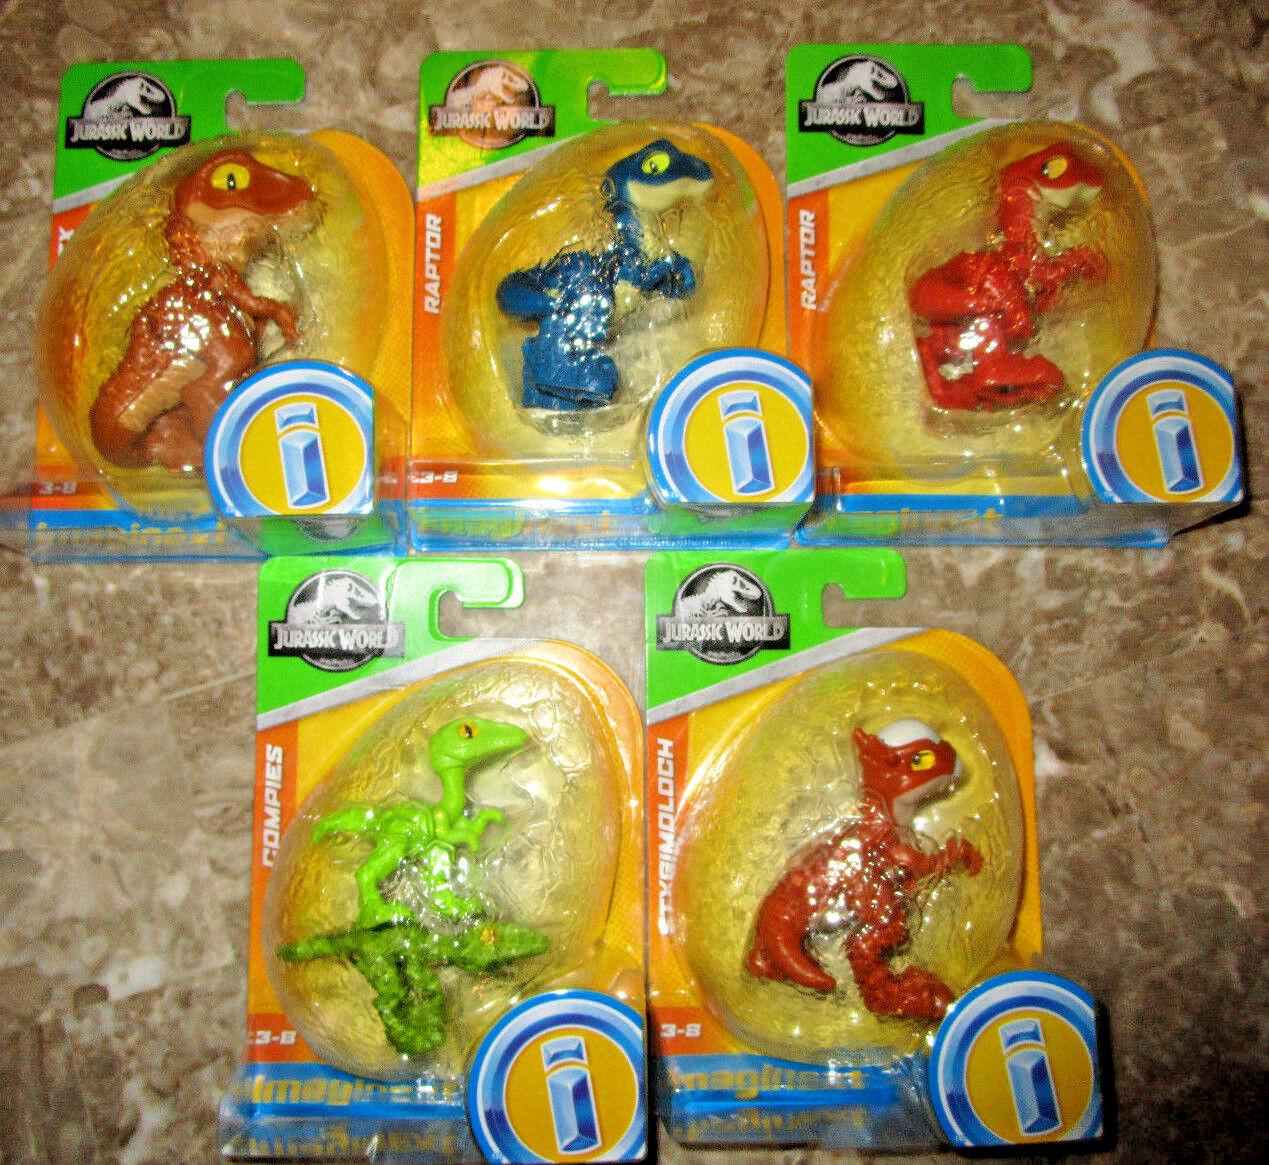 Imaginext jurassic world dinosaurier zahlen reihe 5 eier compies styggy raptor t - rex